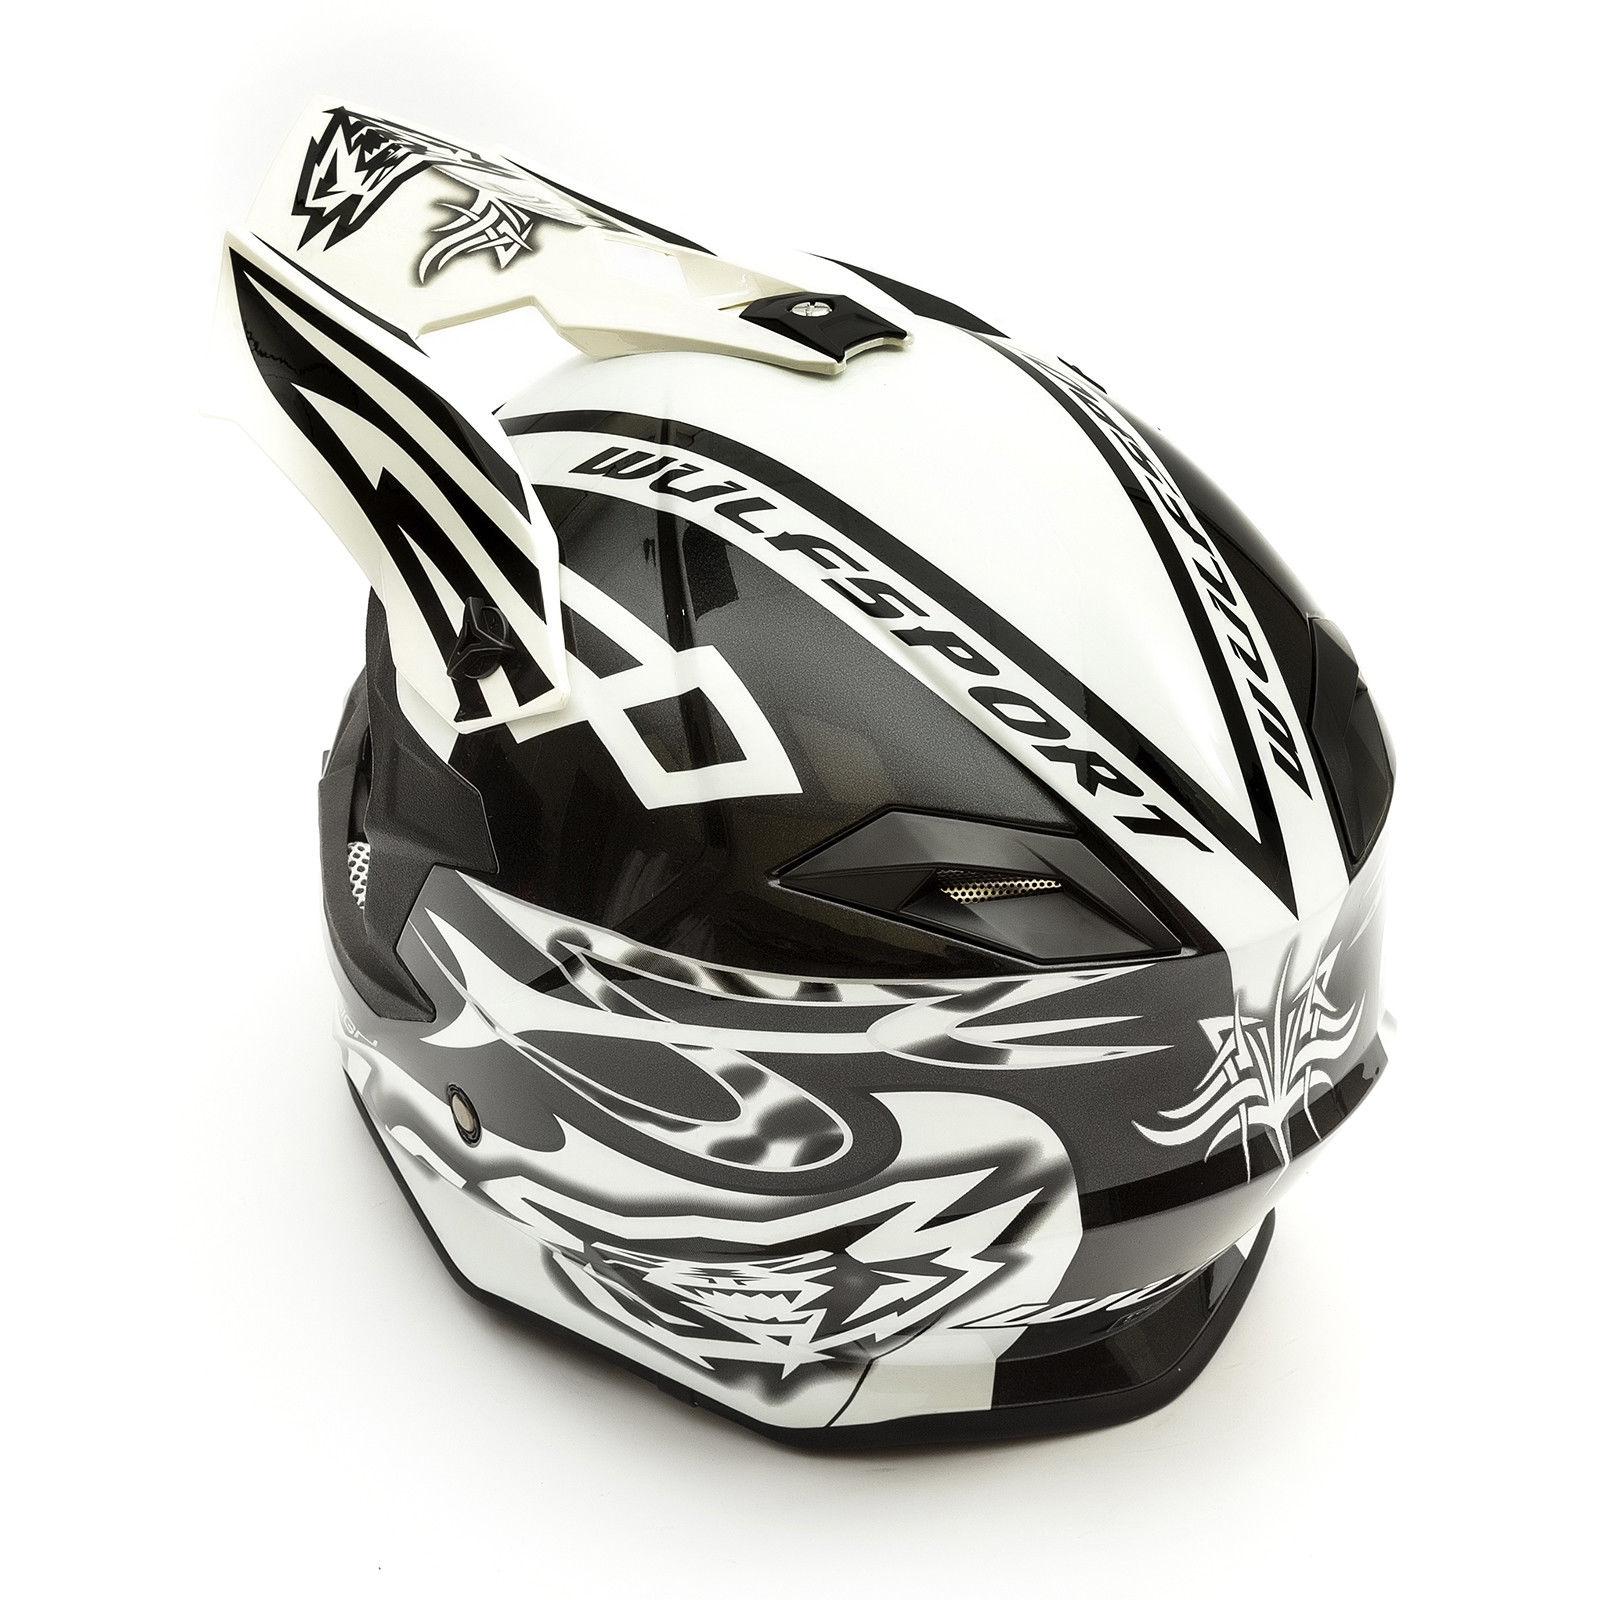 Wulfsport-Adult-Sceptre-Helmets-Motocross-Pitbike-Motorbike-Off-Road-Racing-ATV thumbnail 53